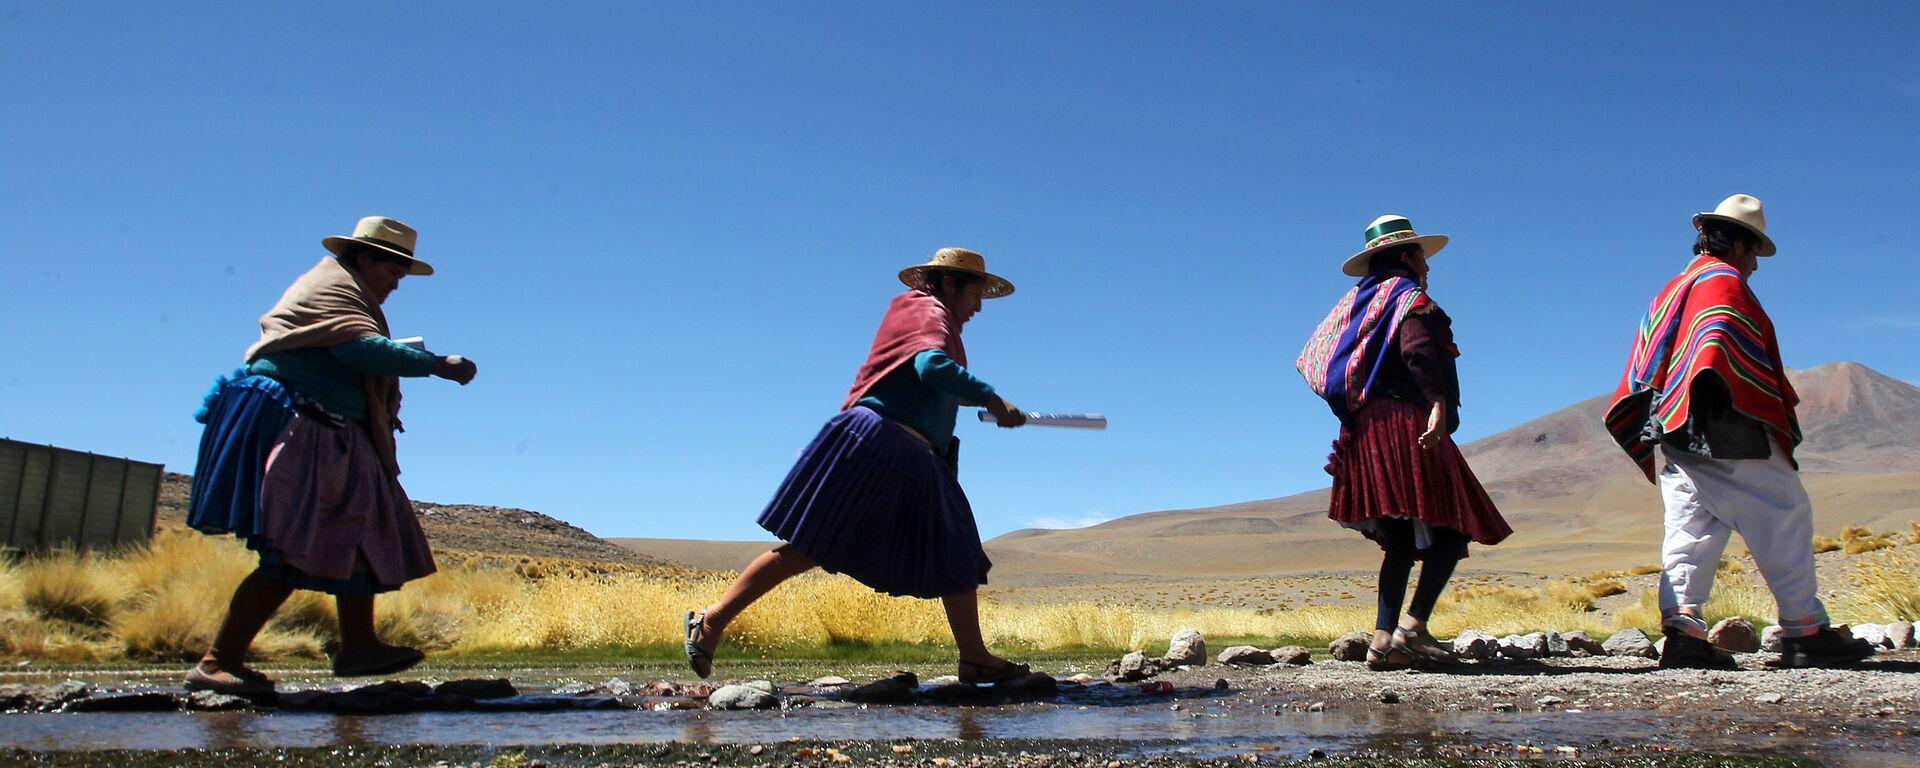 Indígenas aimará en Bolivia - Sputnik Mundo, 1920, 09.12.2020